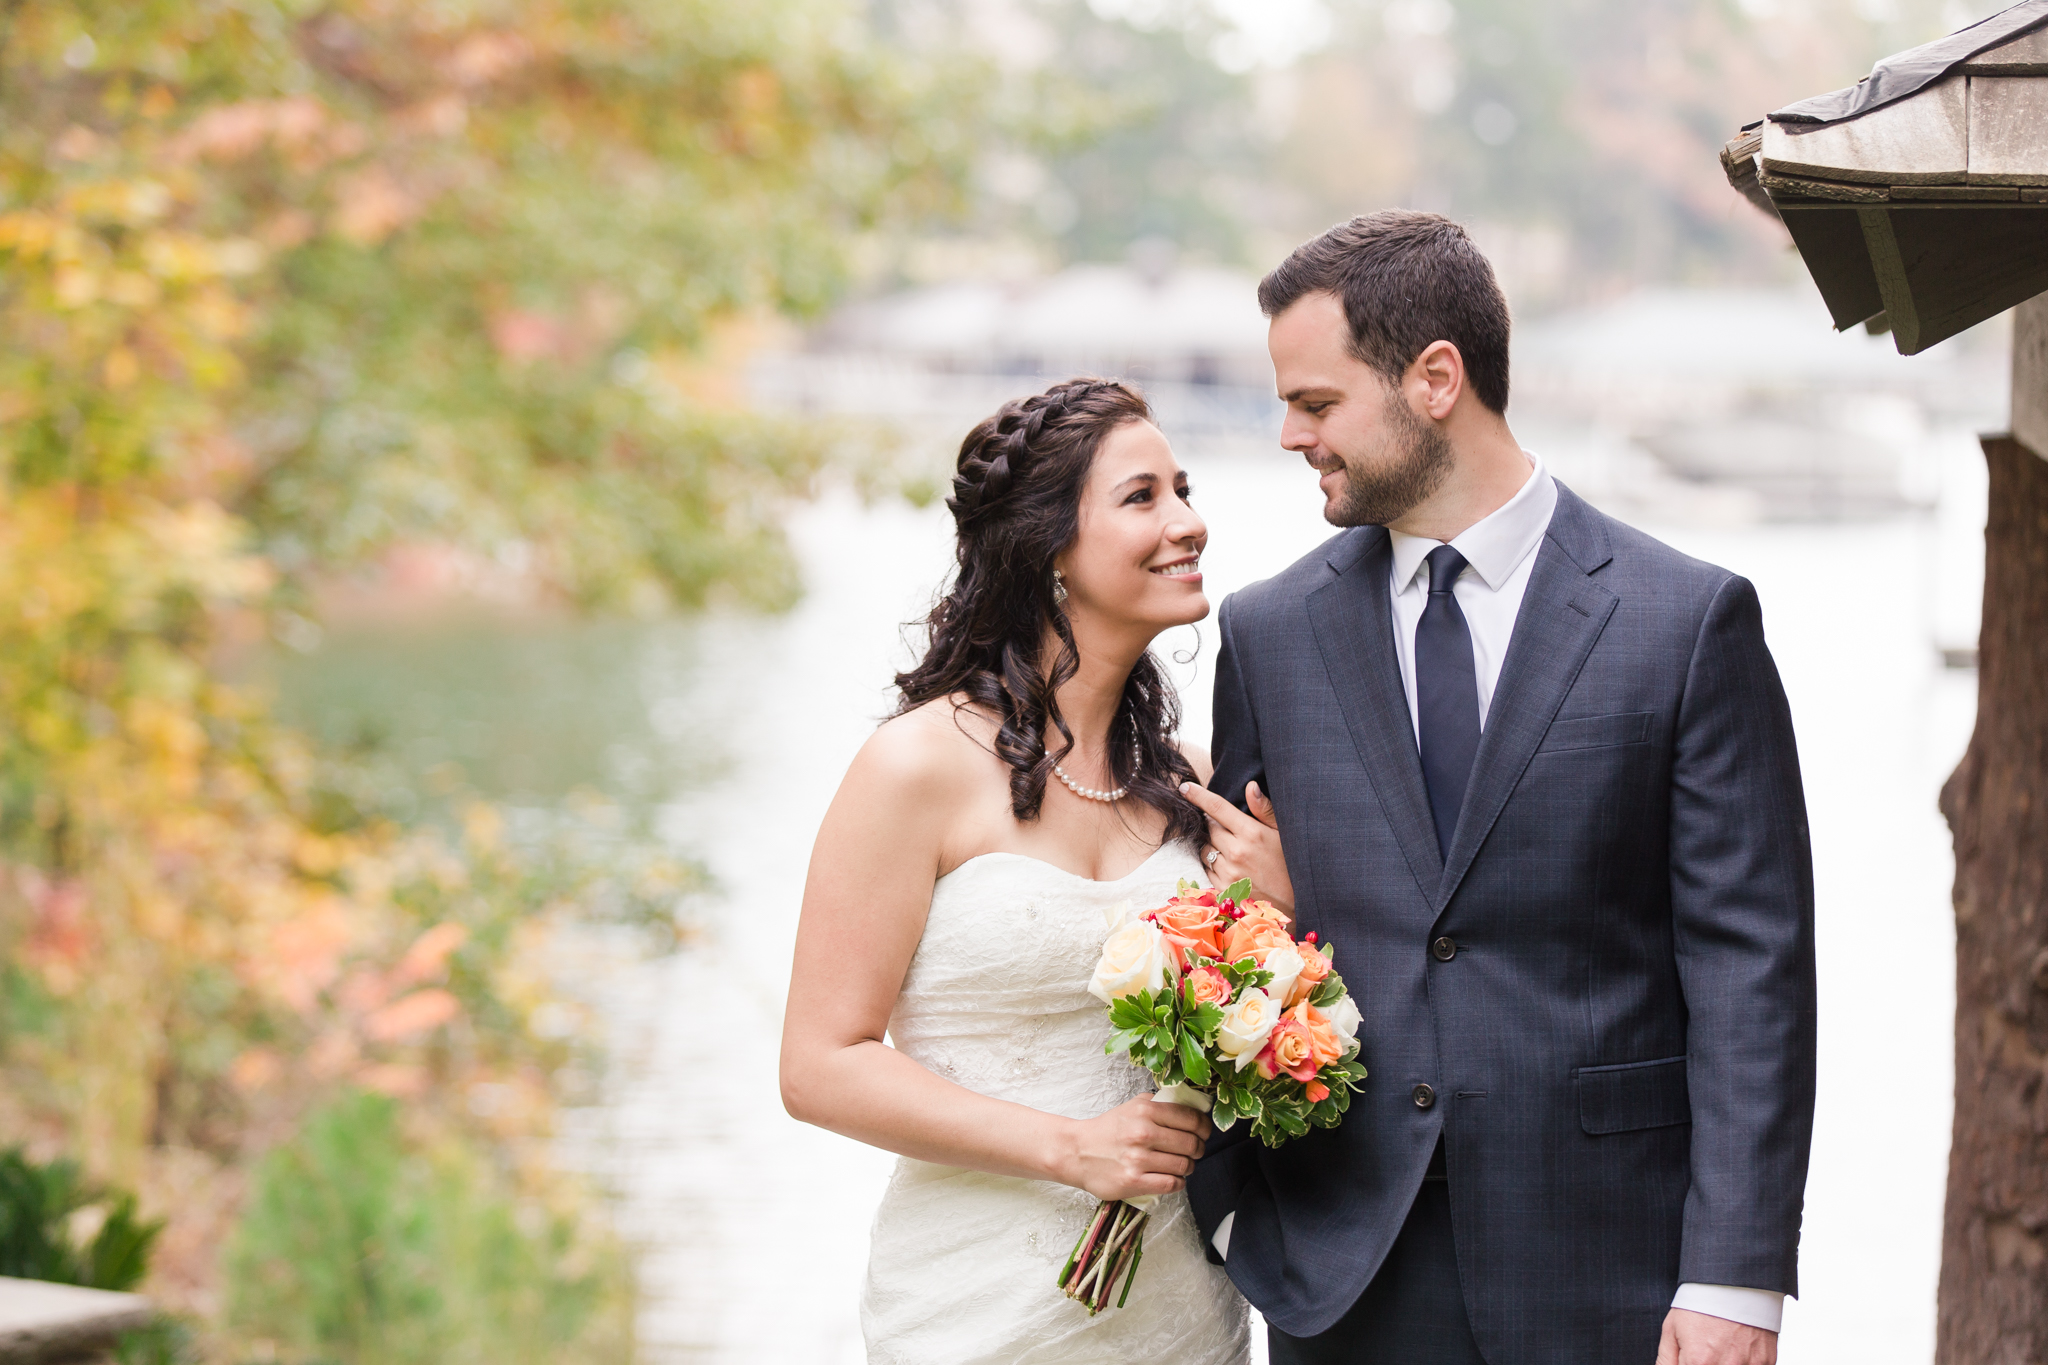 Ashley-Amber-Photo-Outdoor-Wedding-Photography-154530.jpg